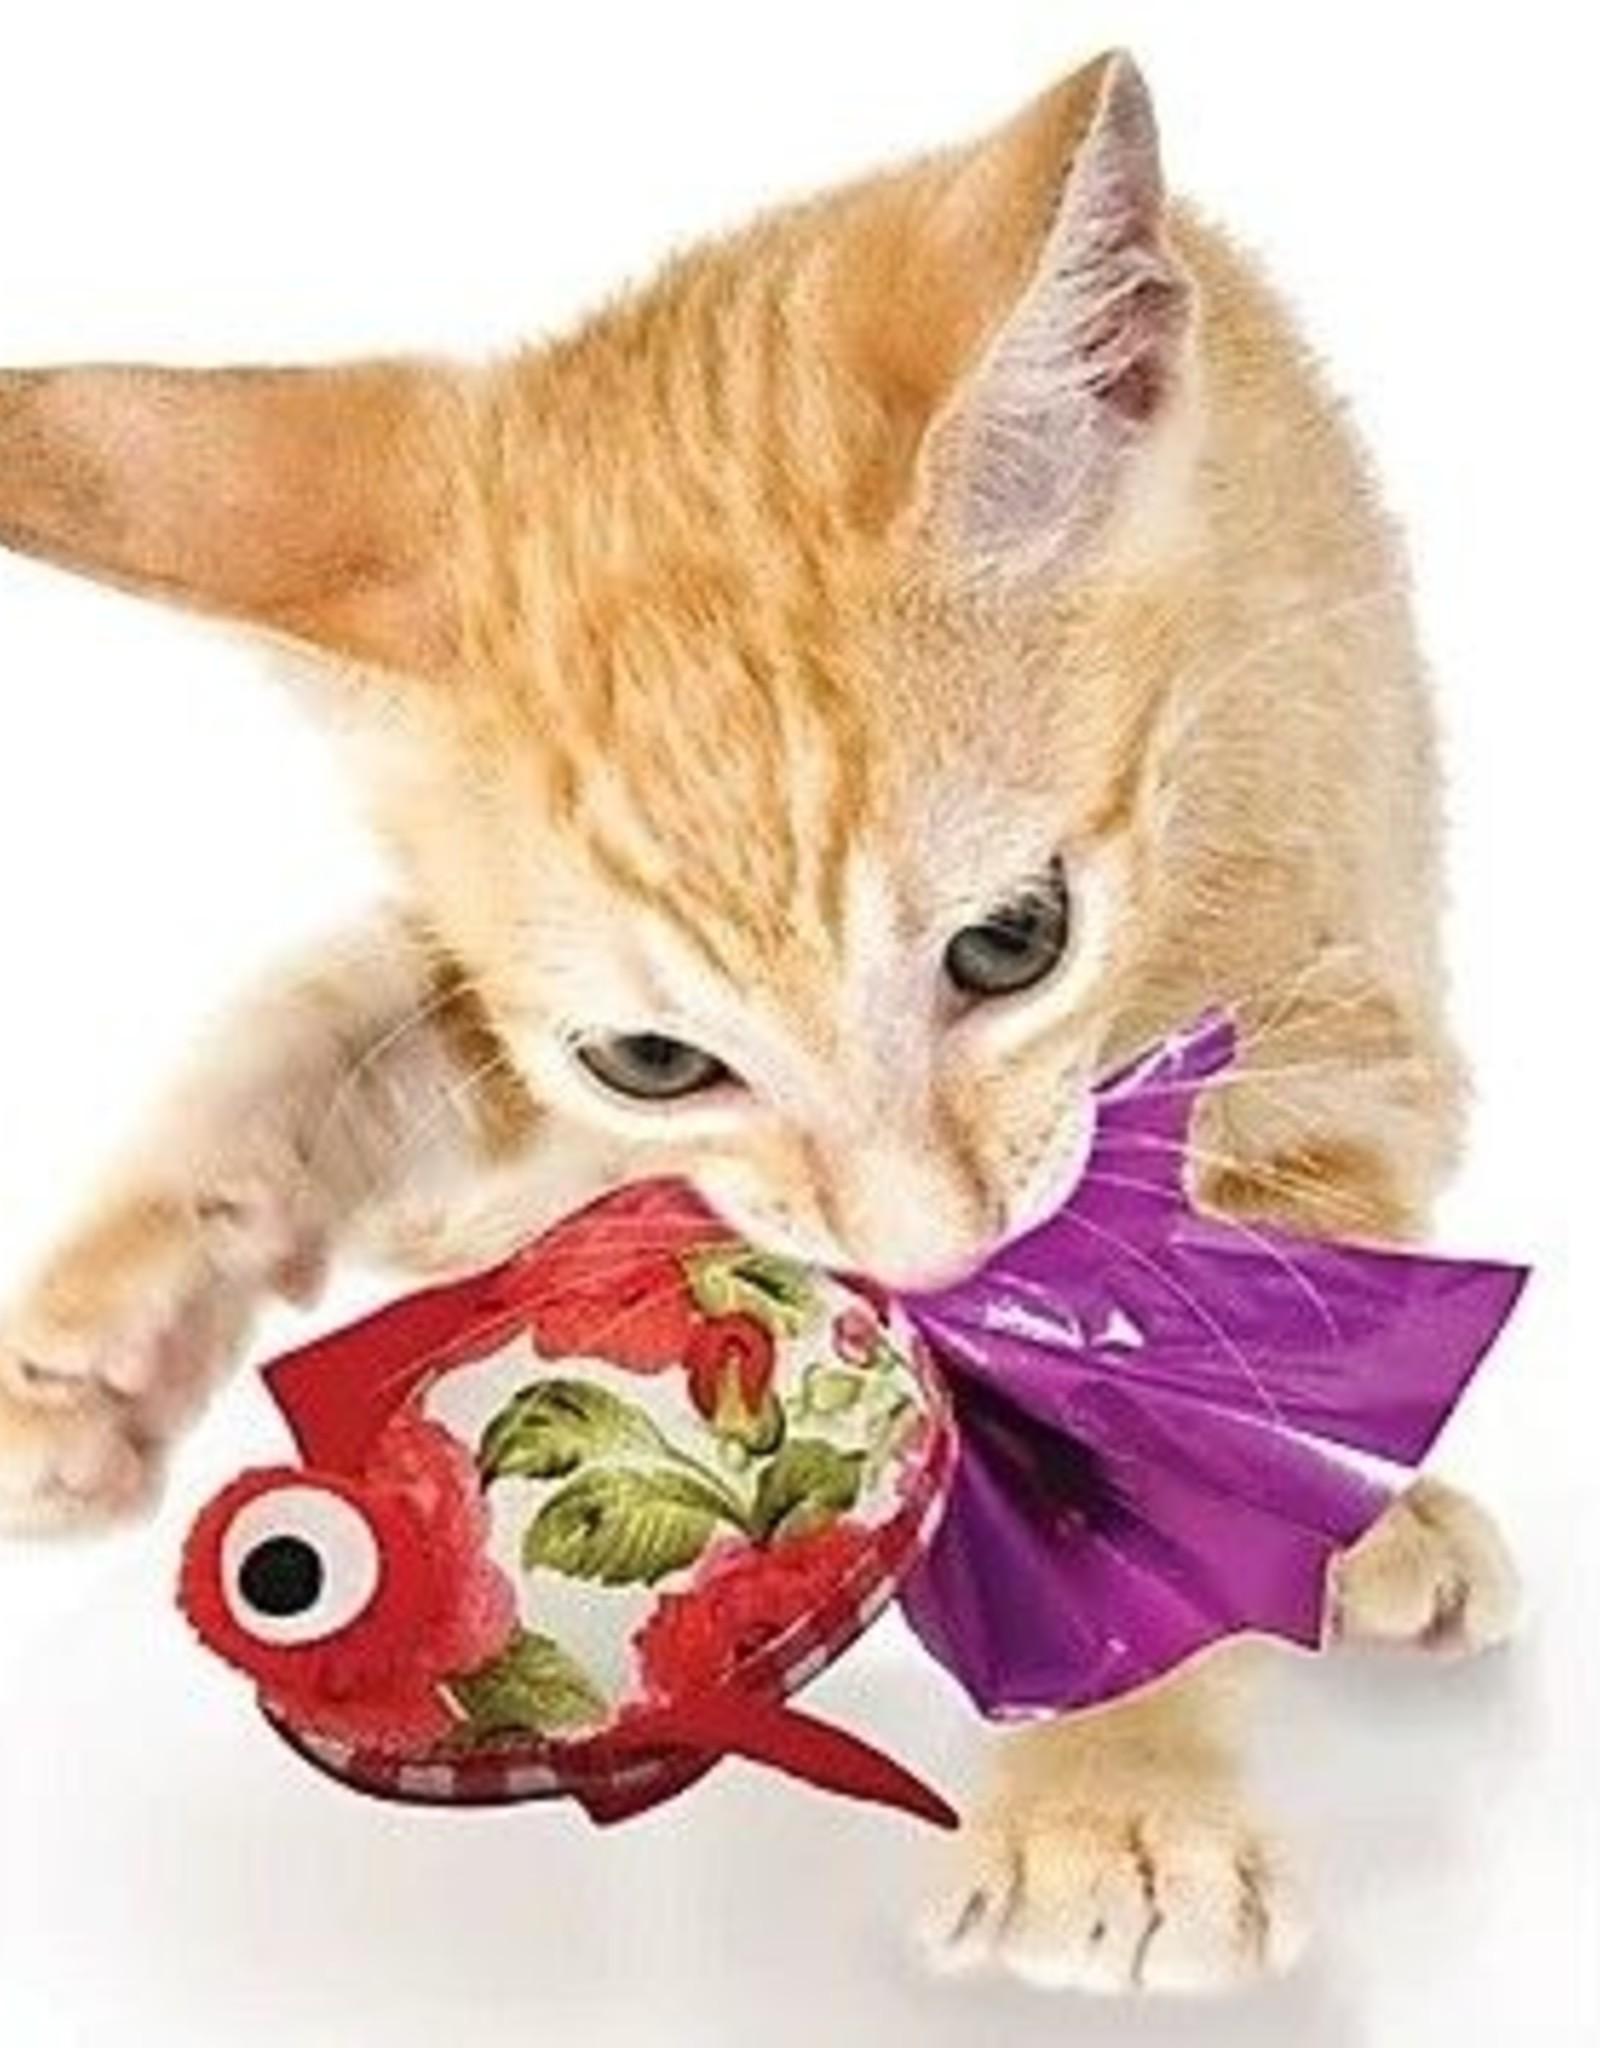 Goli Crink-A-Fish